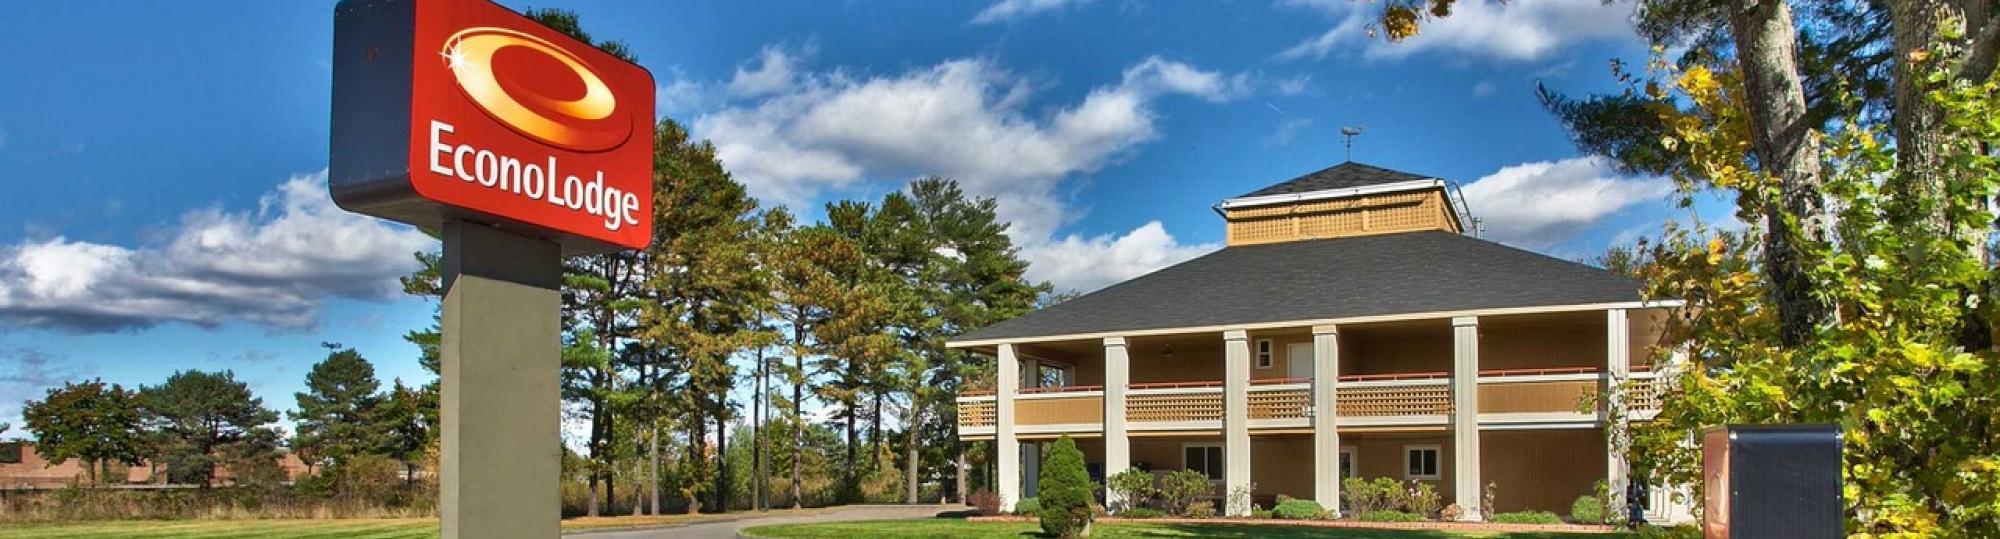 Econo Lodge Military Discount with Veterans Advantage